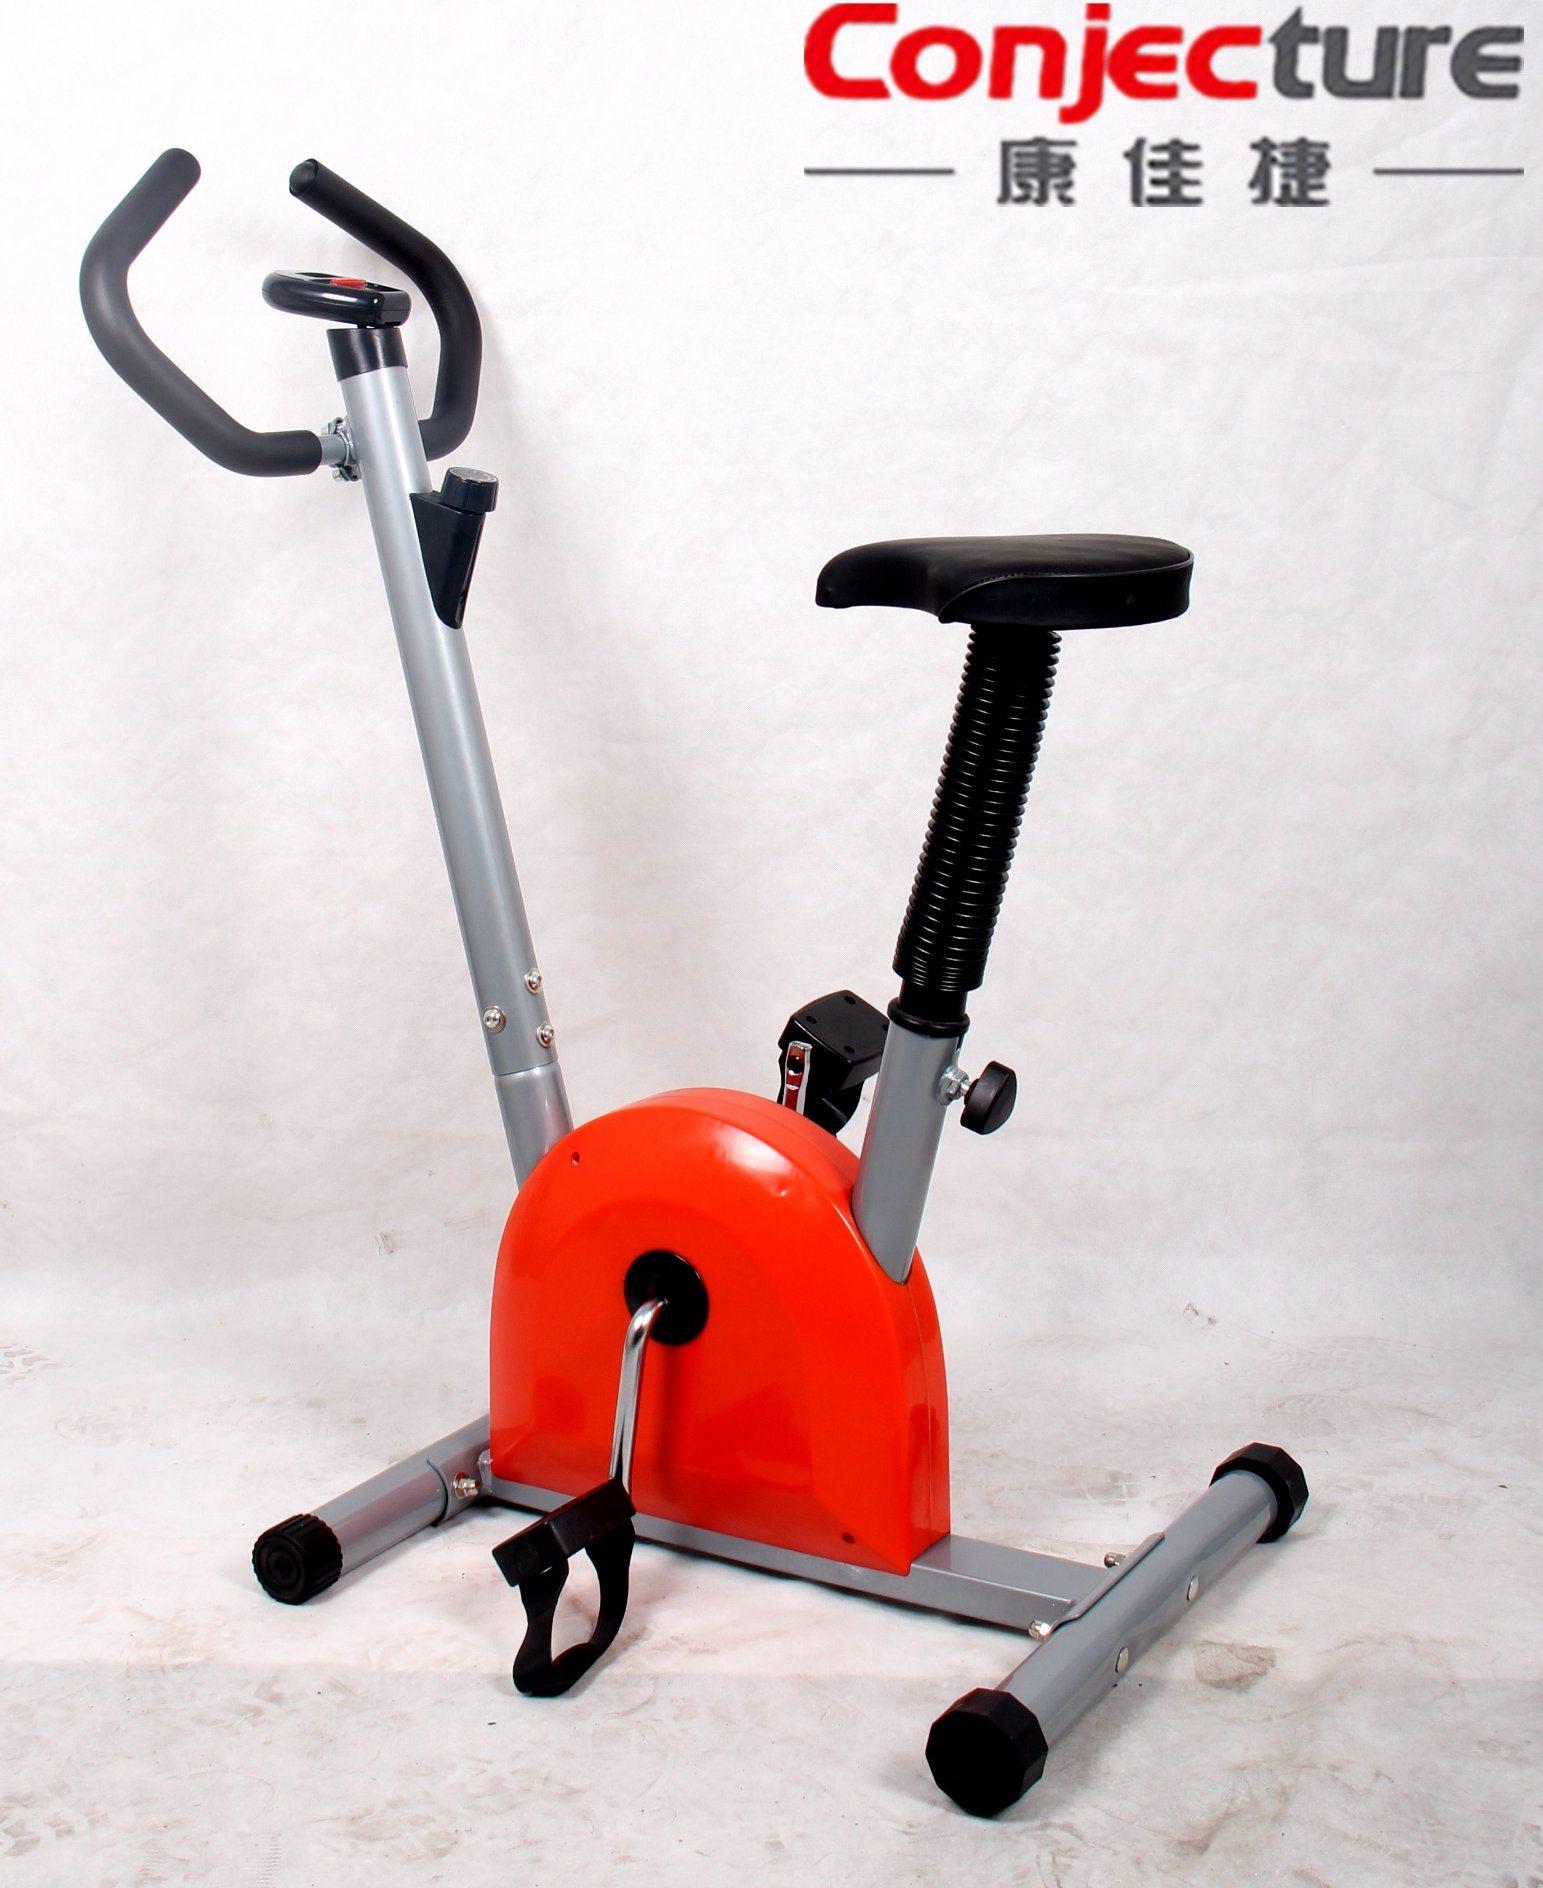 2016 New Model Hot Selling Home Fit Bike/Fitness Exercise Equipment